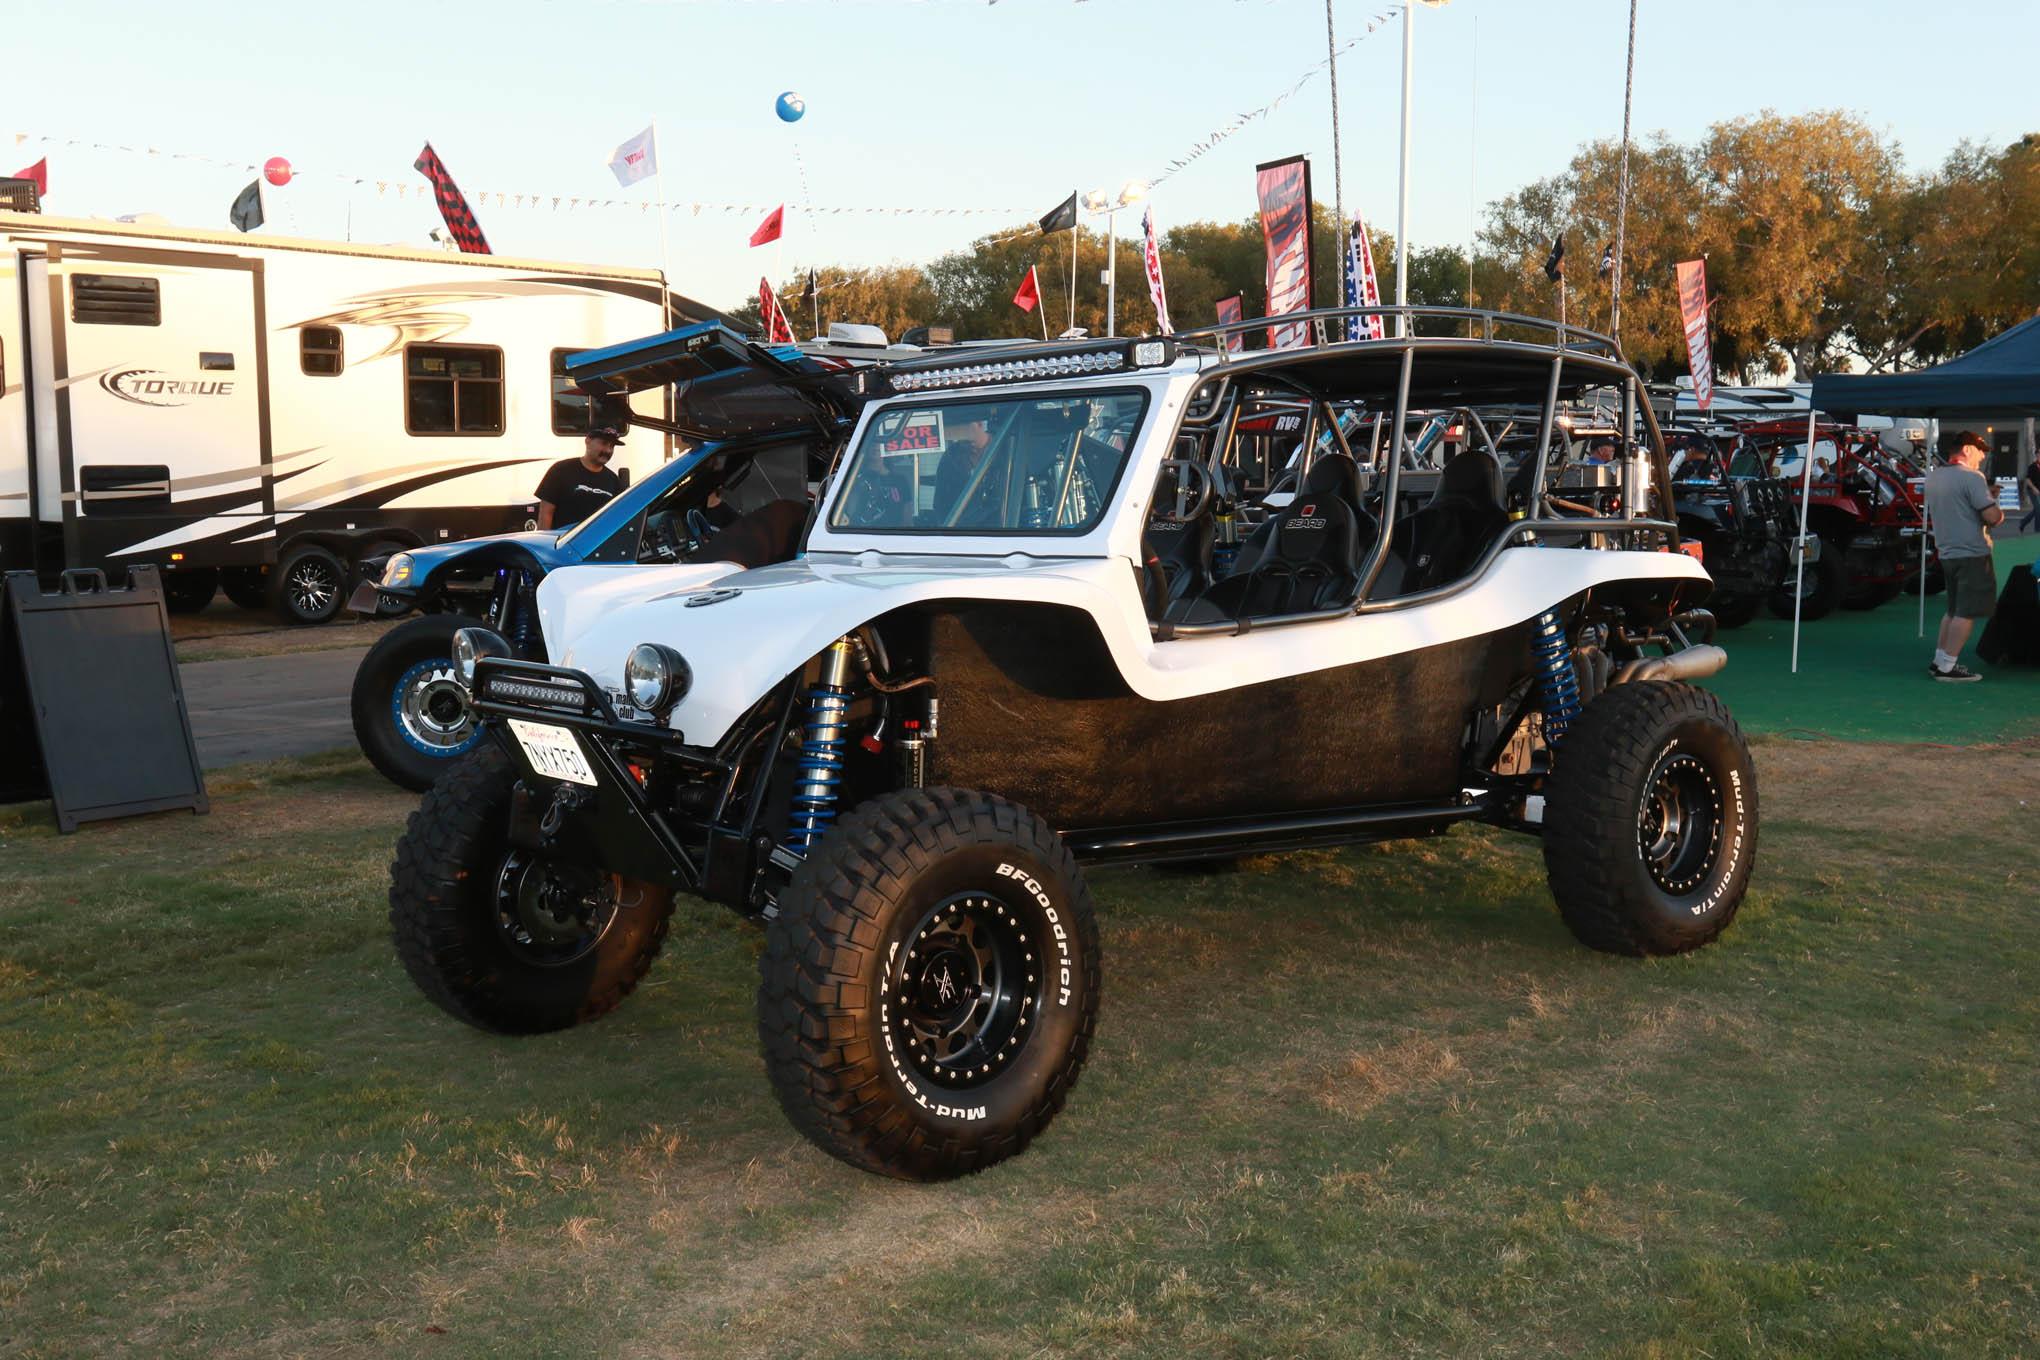 018 sand sport manx buggy medium shot